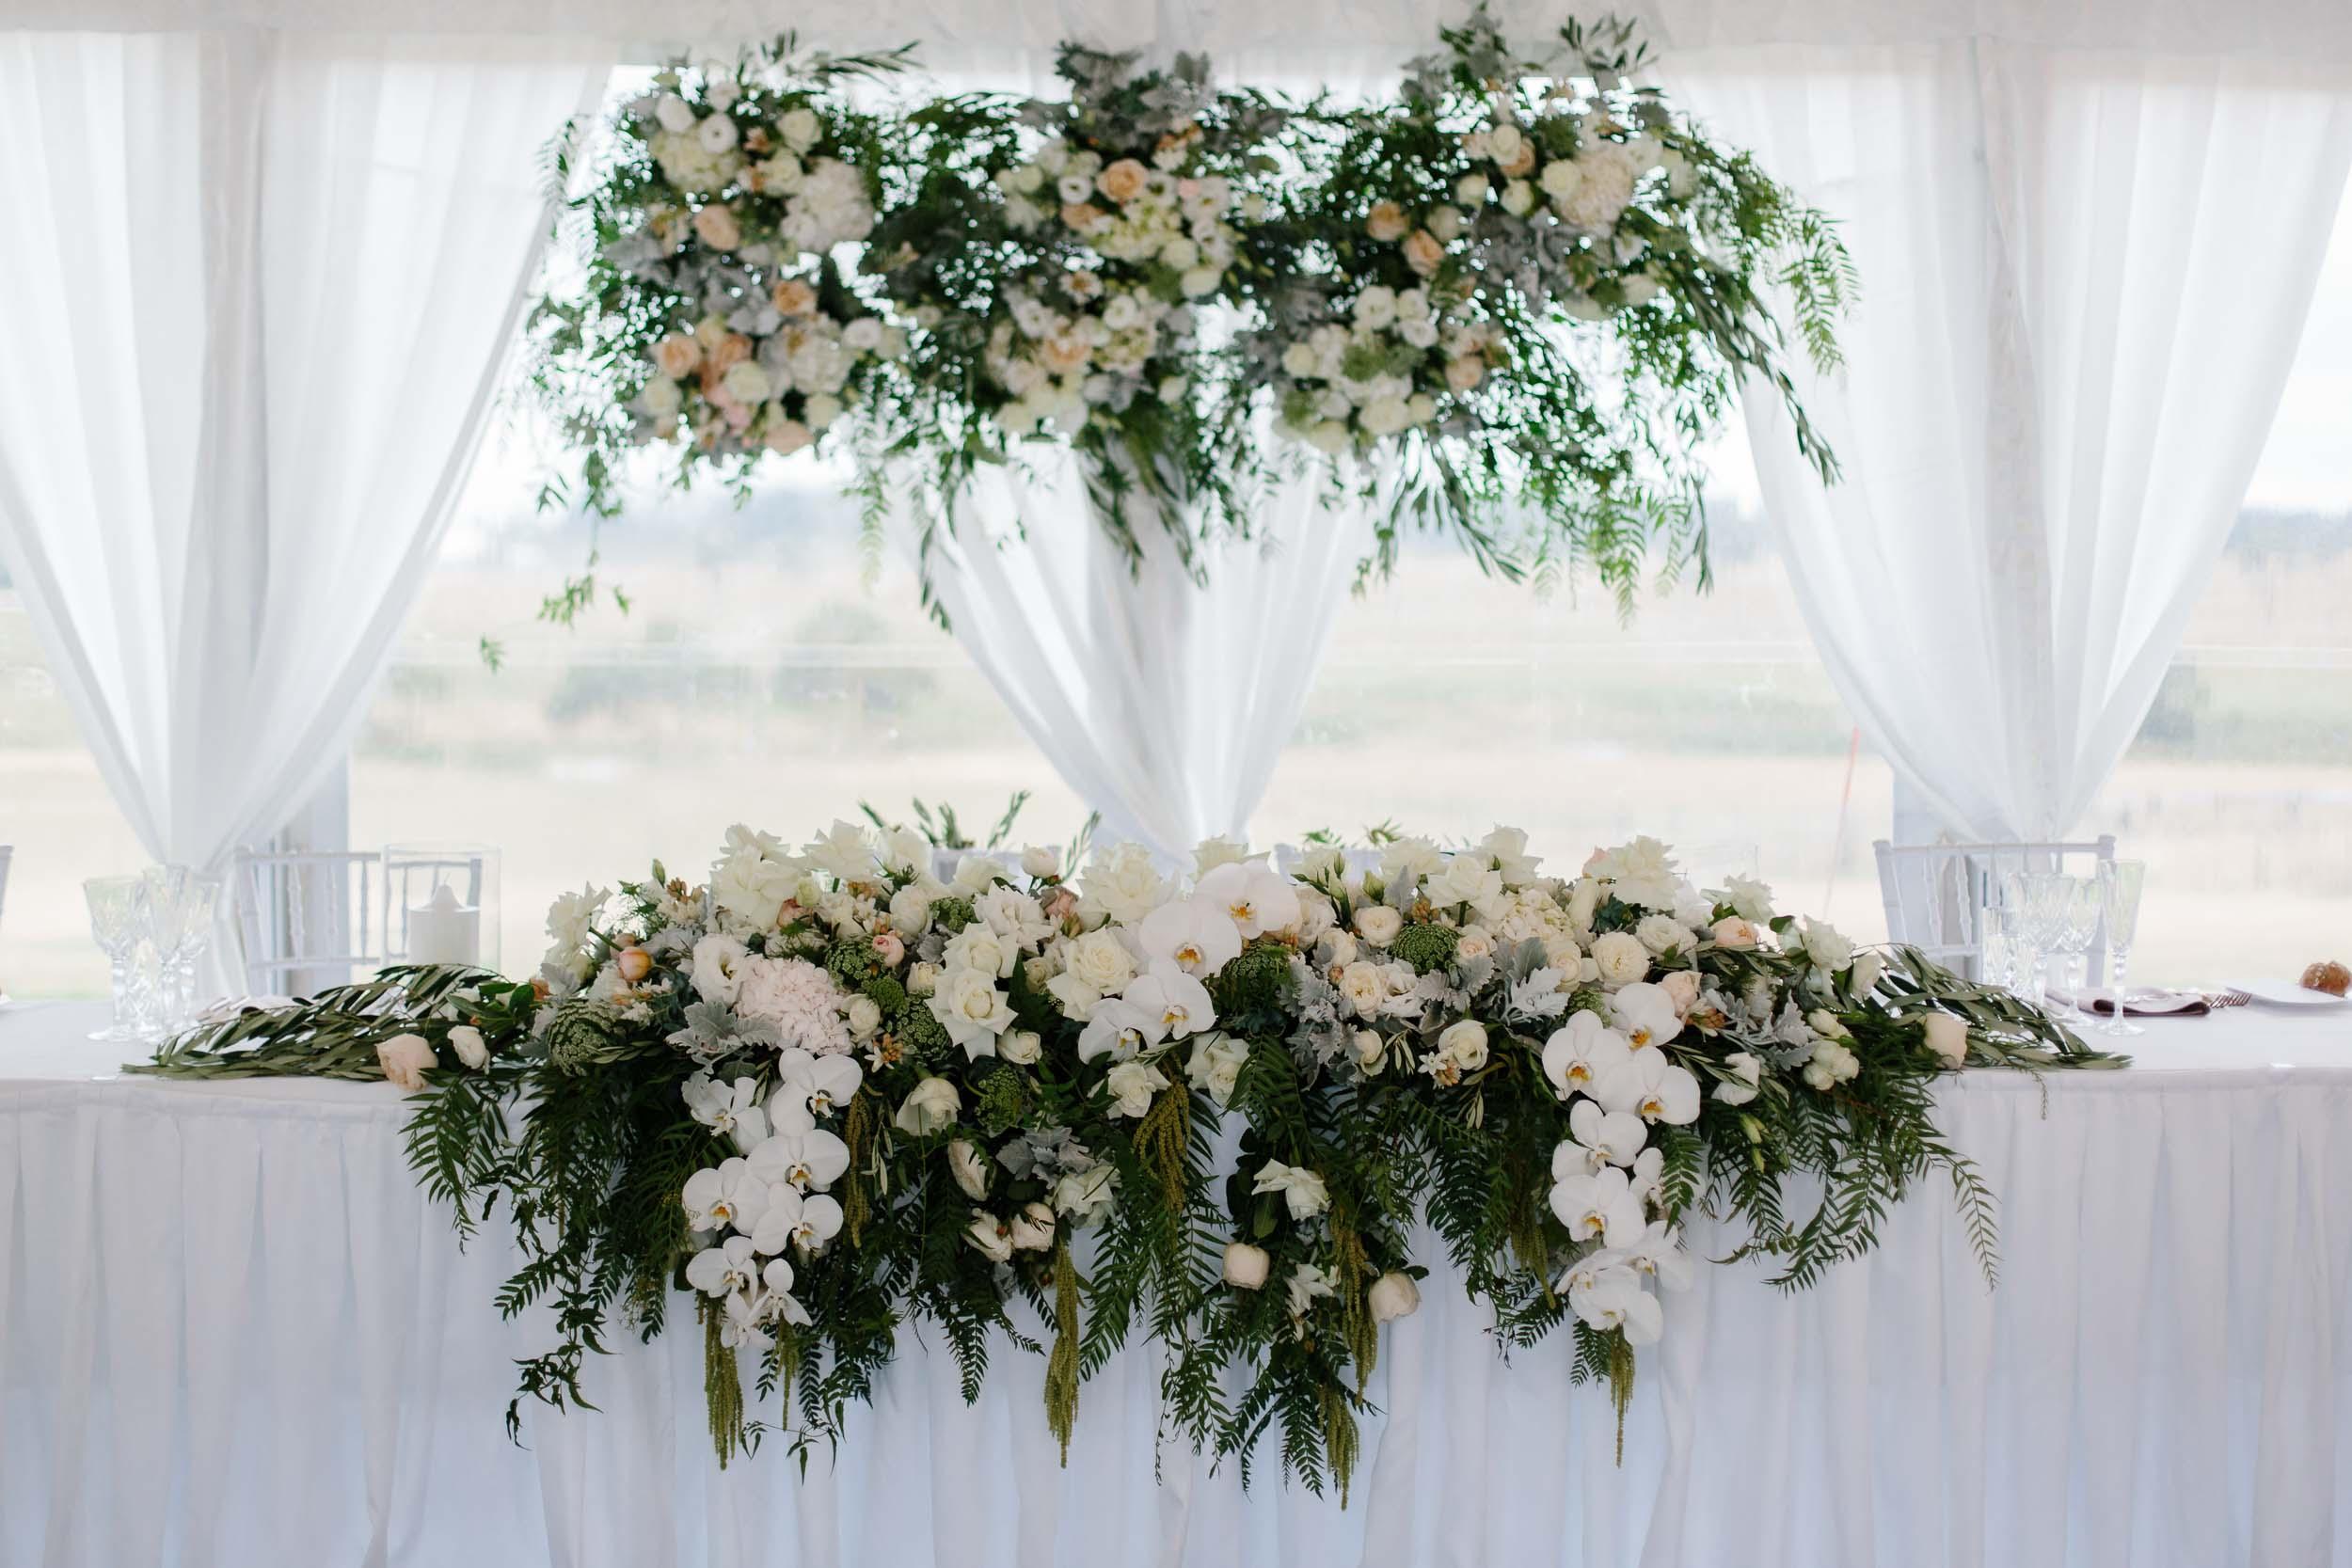 Kas-Richards-Mornington-Peninsula-Private-Property-Wedding-Marianna-Hardwick-Gown-526.jpg